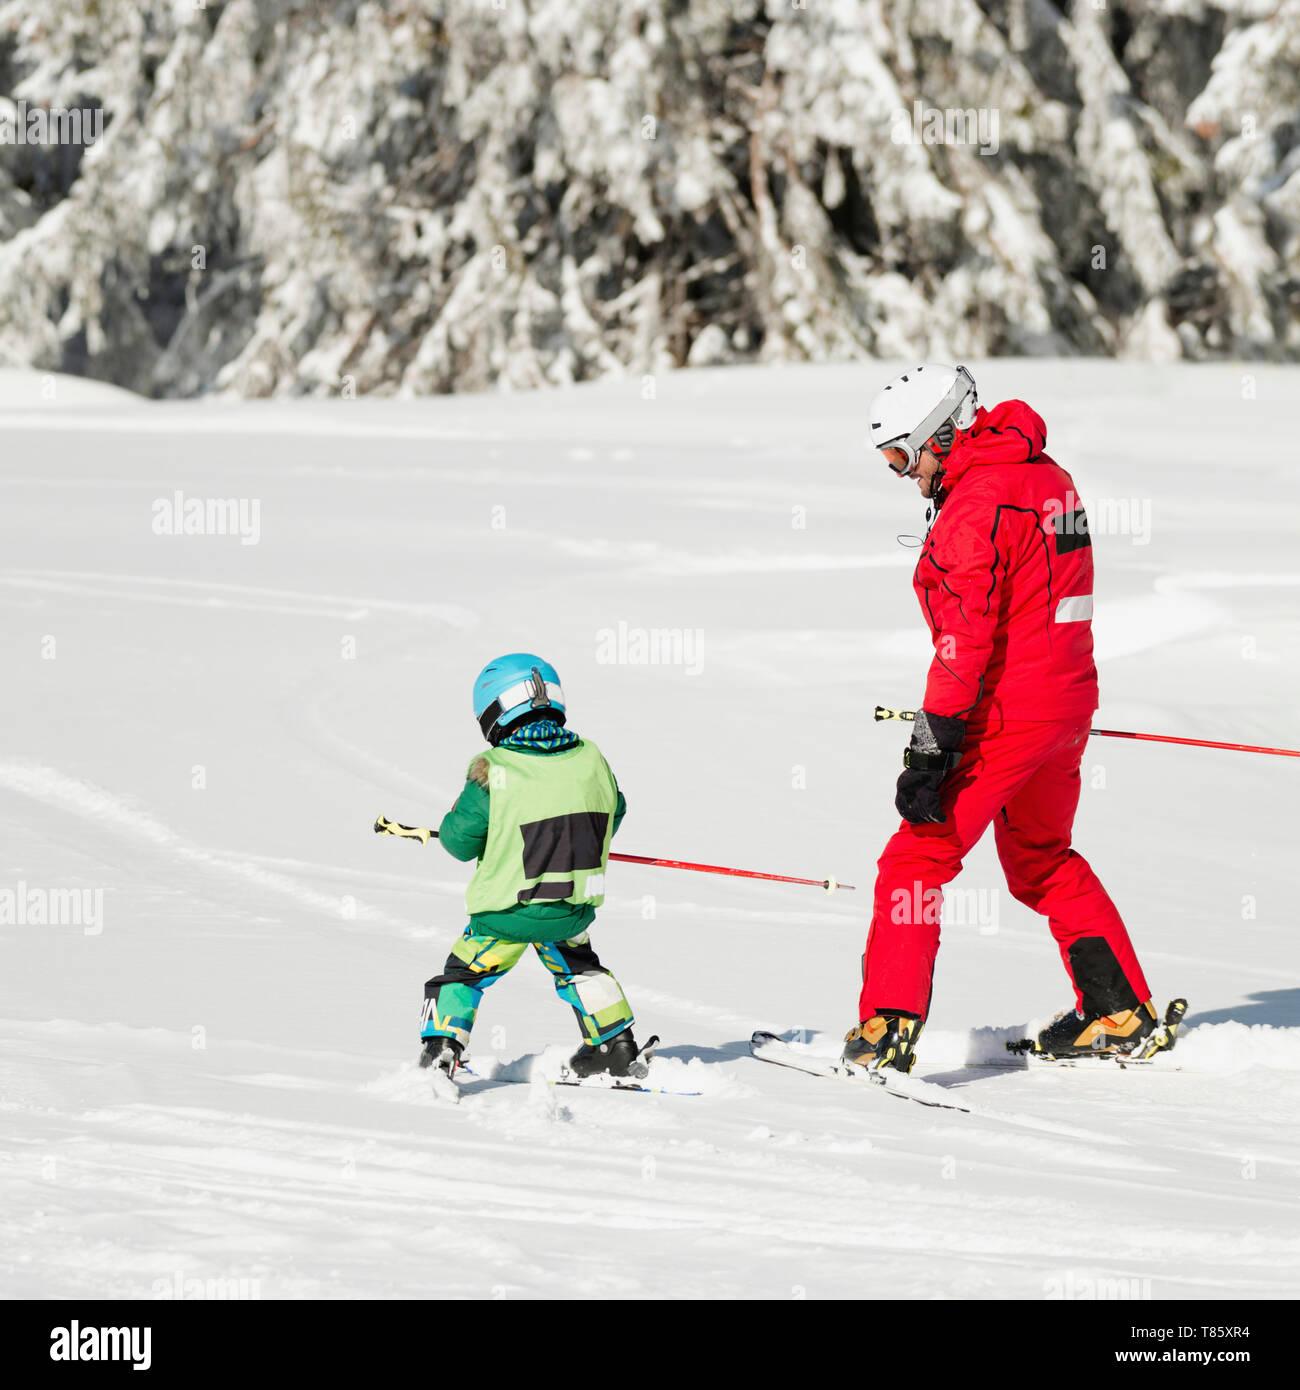 Ski lesson - Stock Image